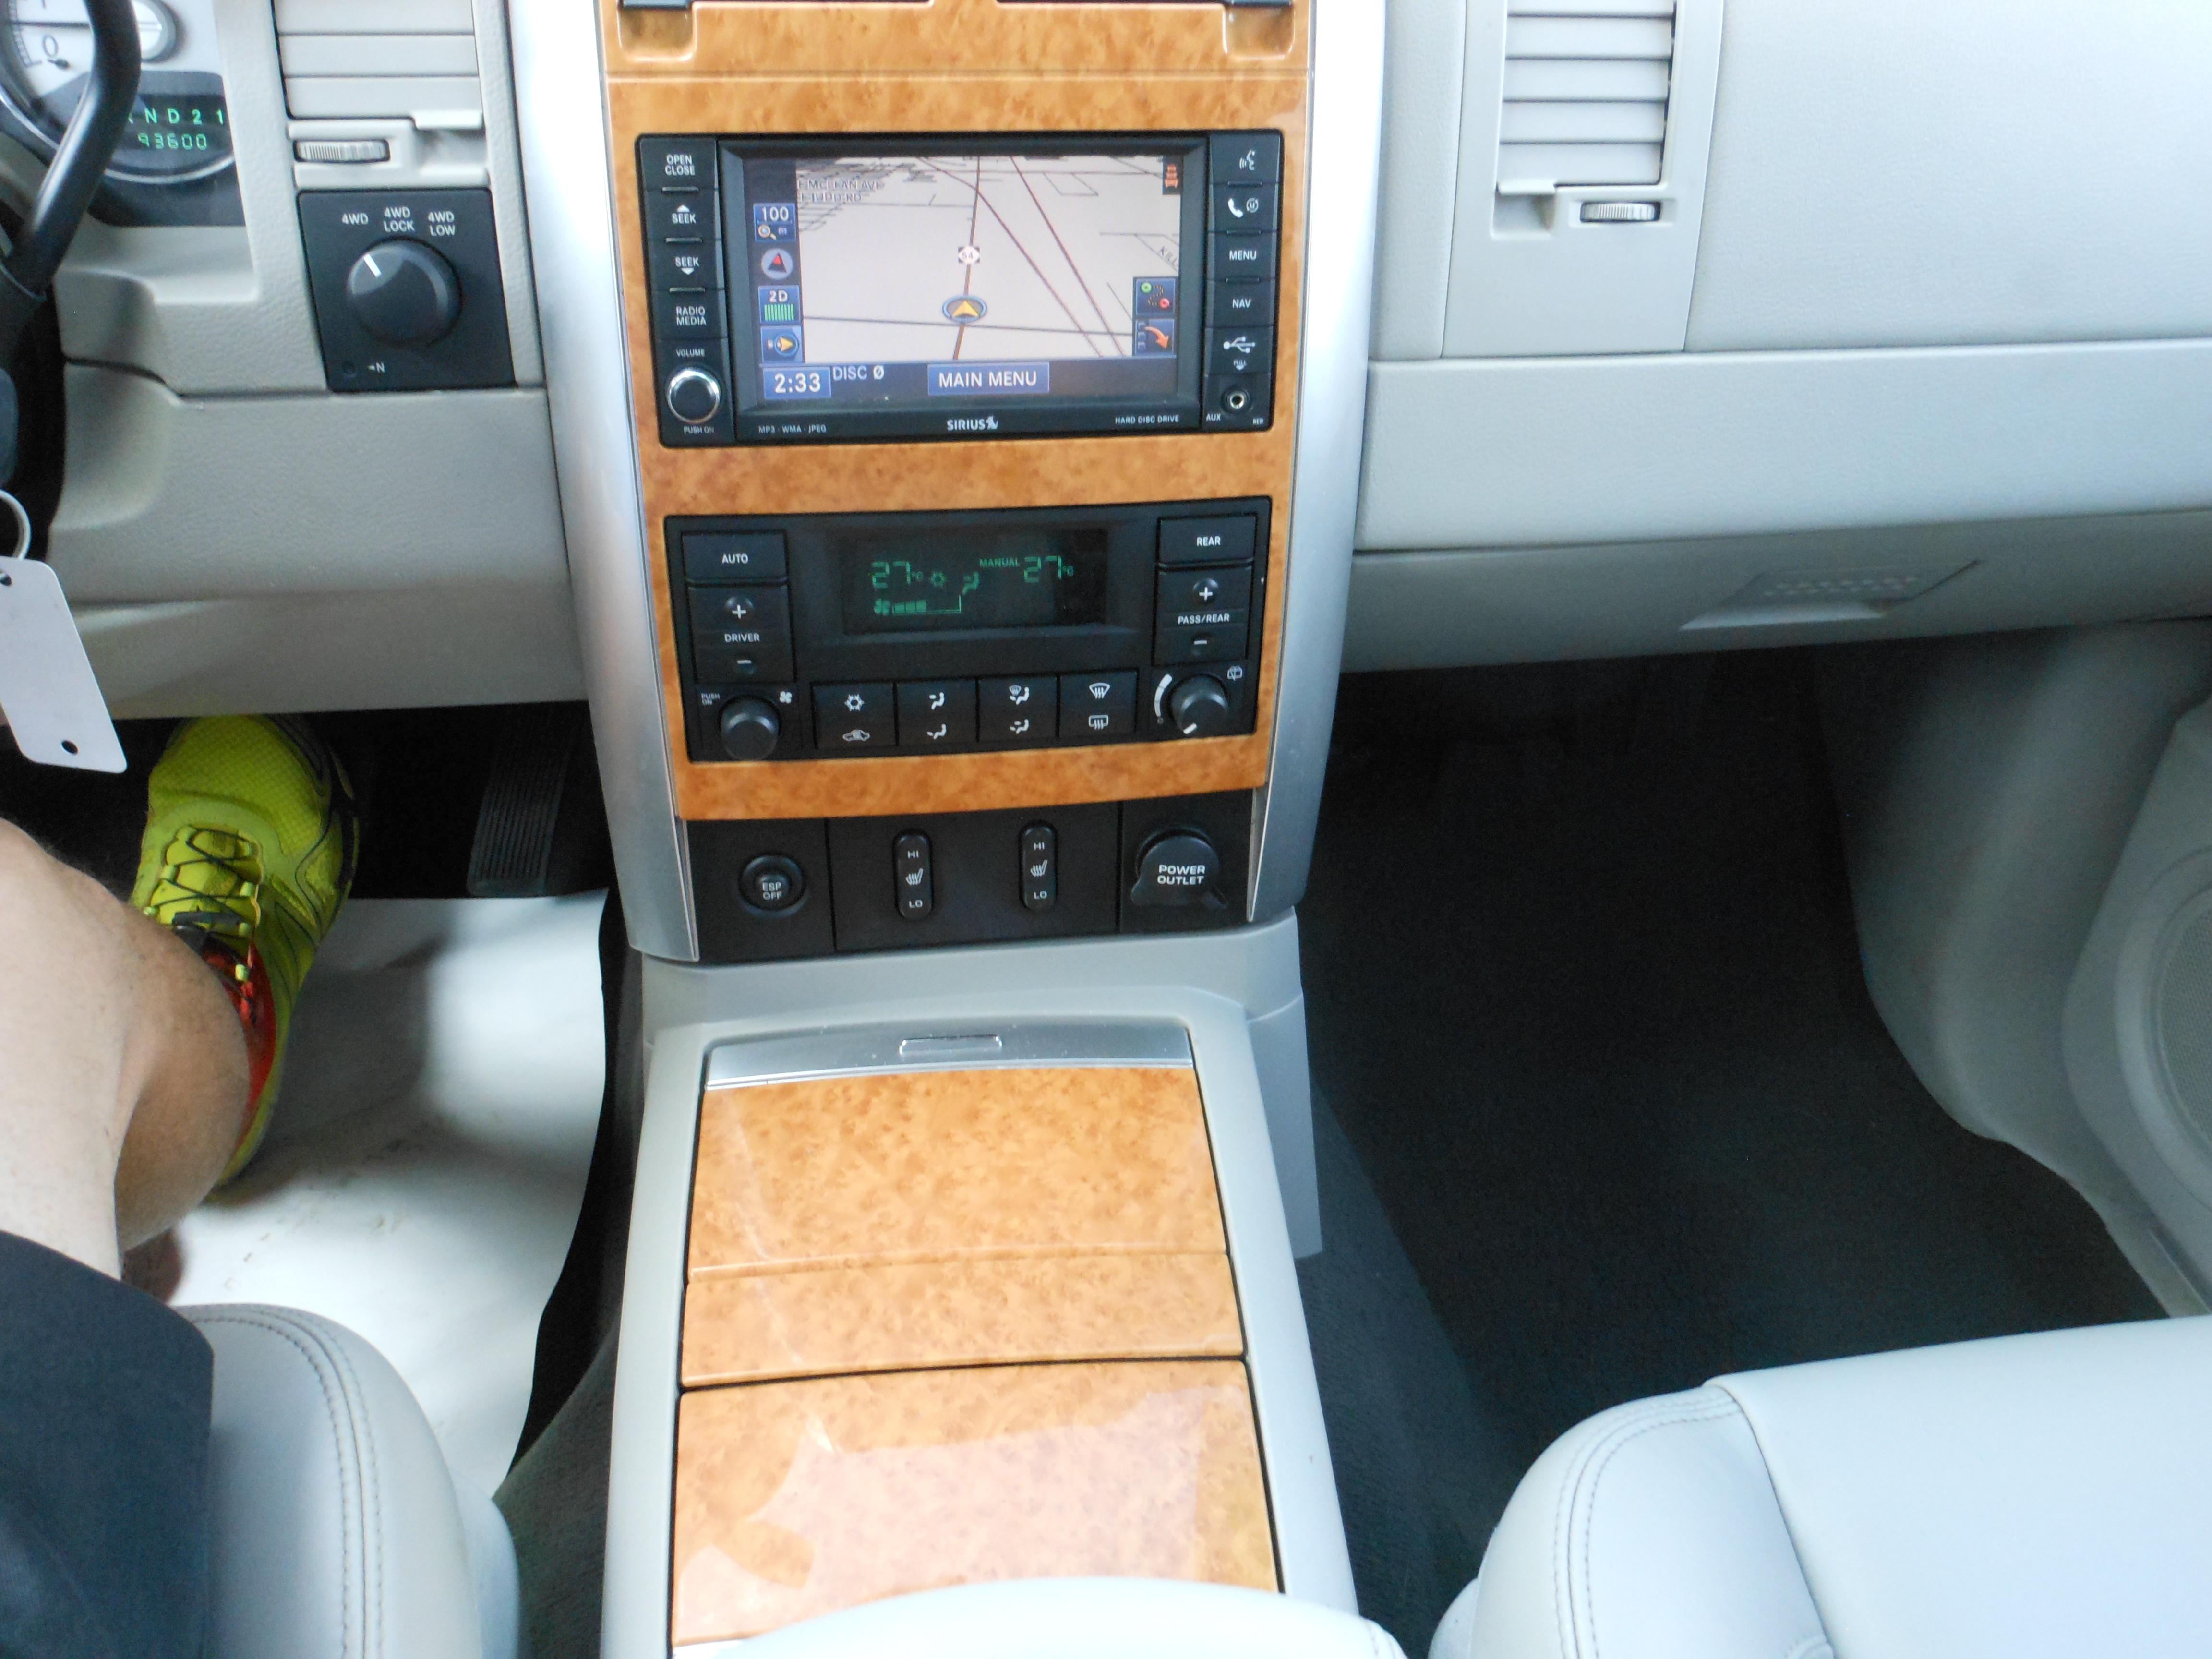 For Sale 2008 Chrysler Aspen Limited 4wd